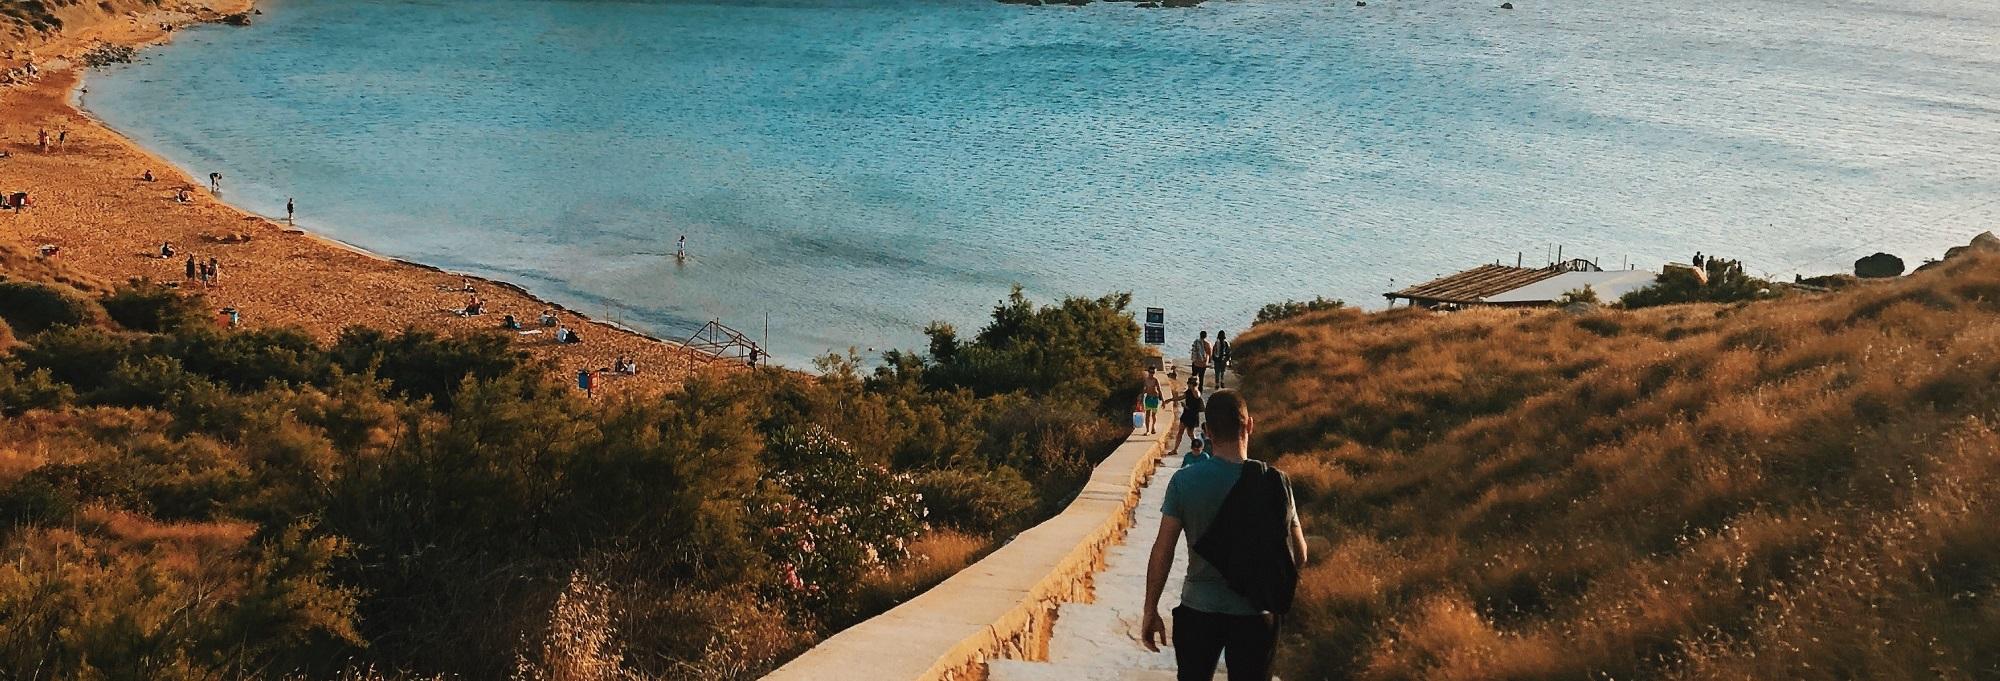 Walking down to Riviera bay in summer